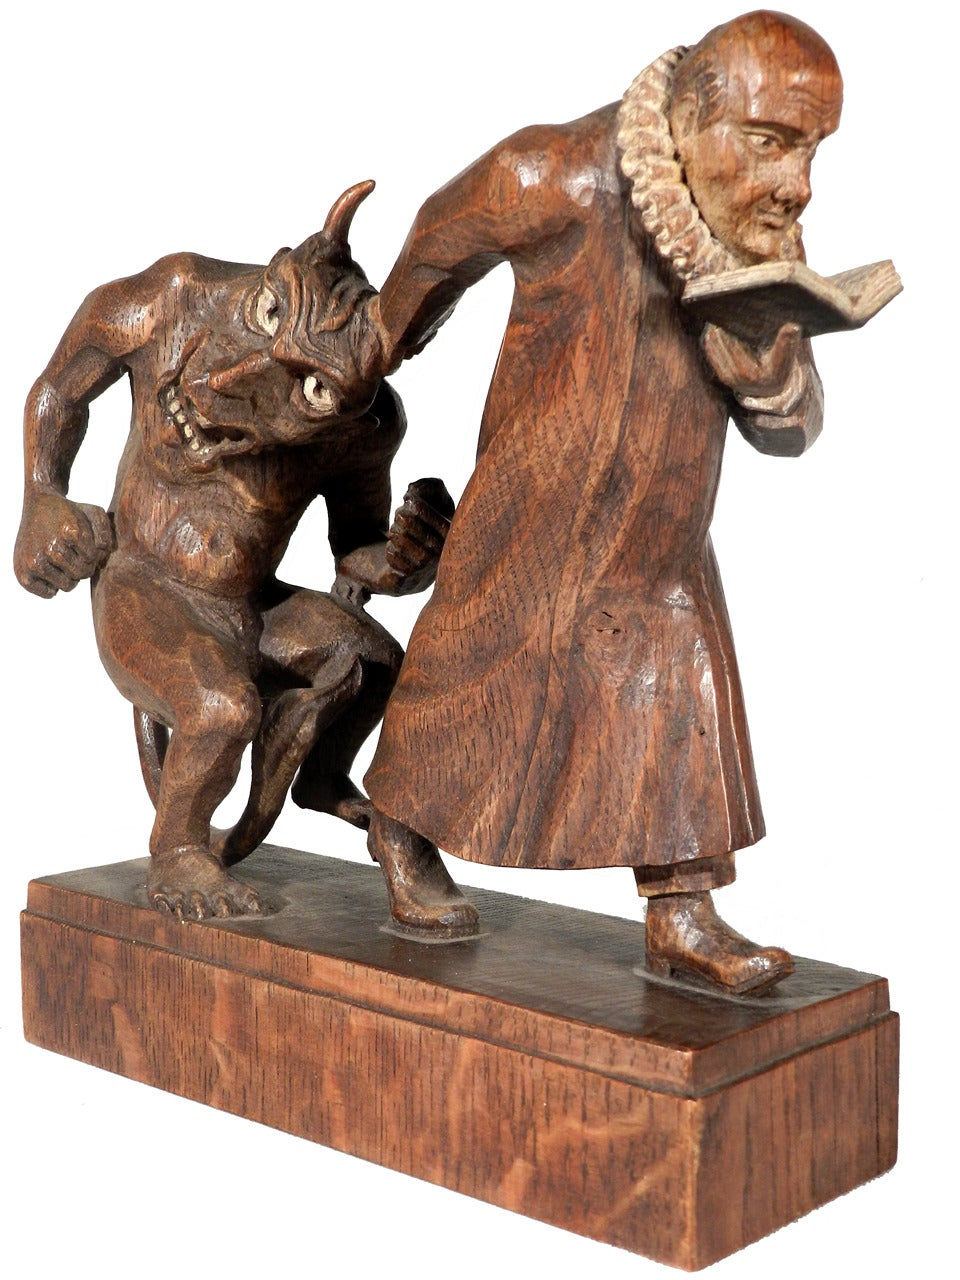 Black Forest Monk and Devil Carving at 1stdibs